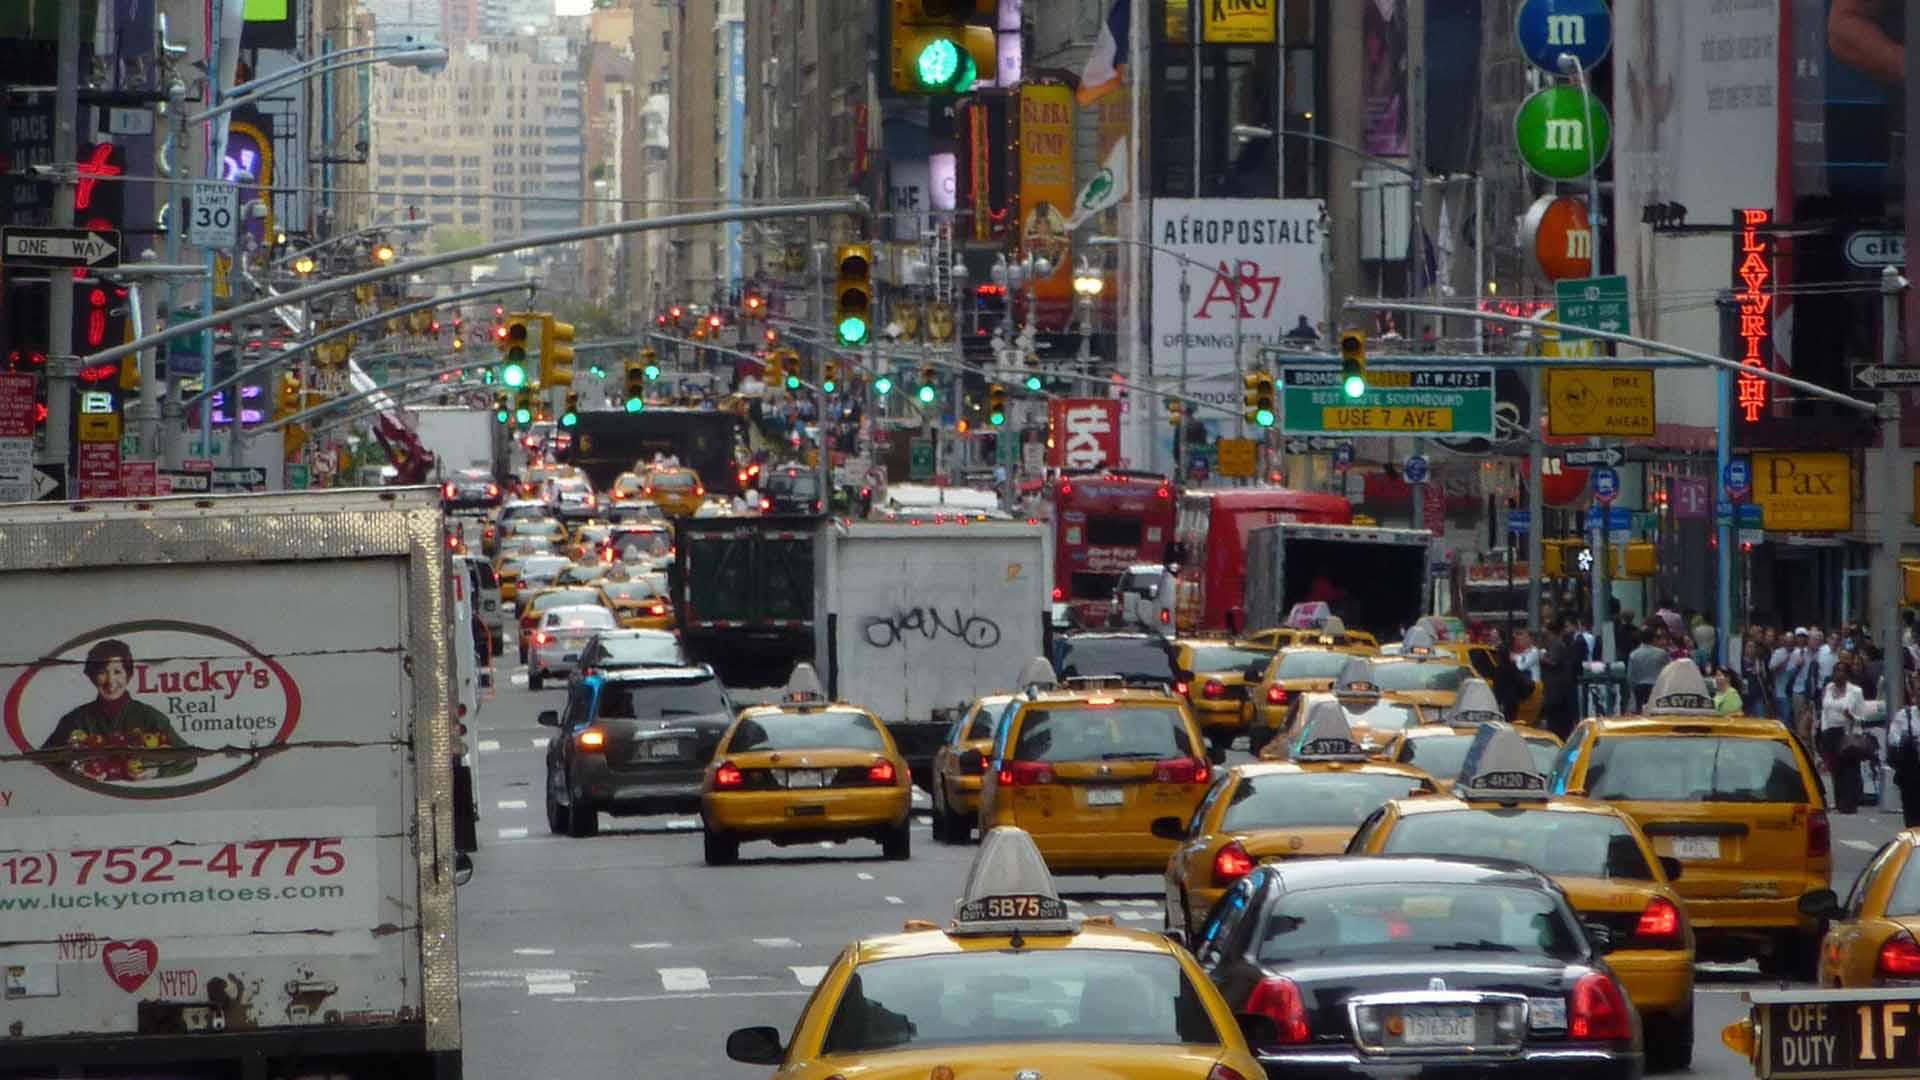 Generare traffico con l'Inbound Marketing